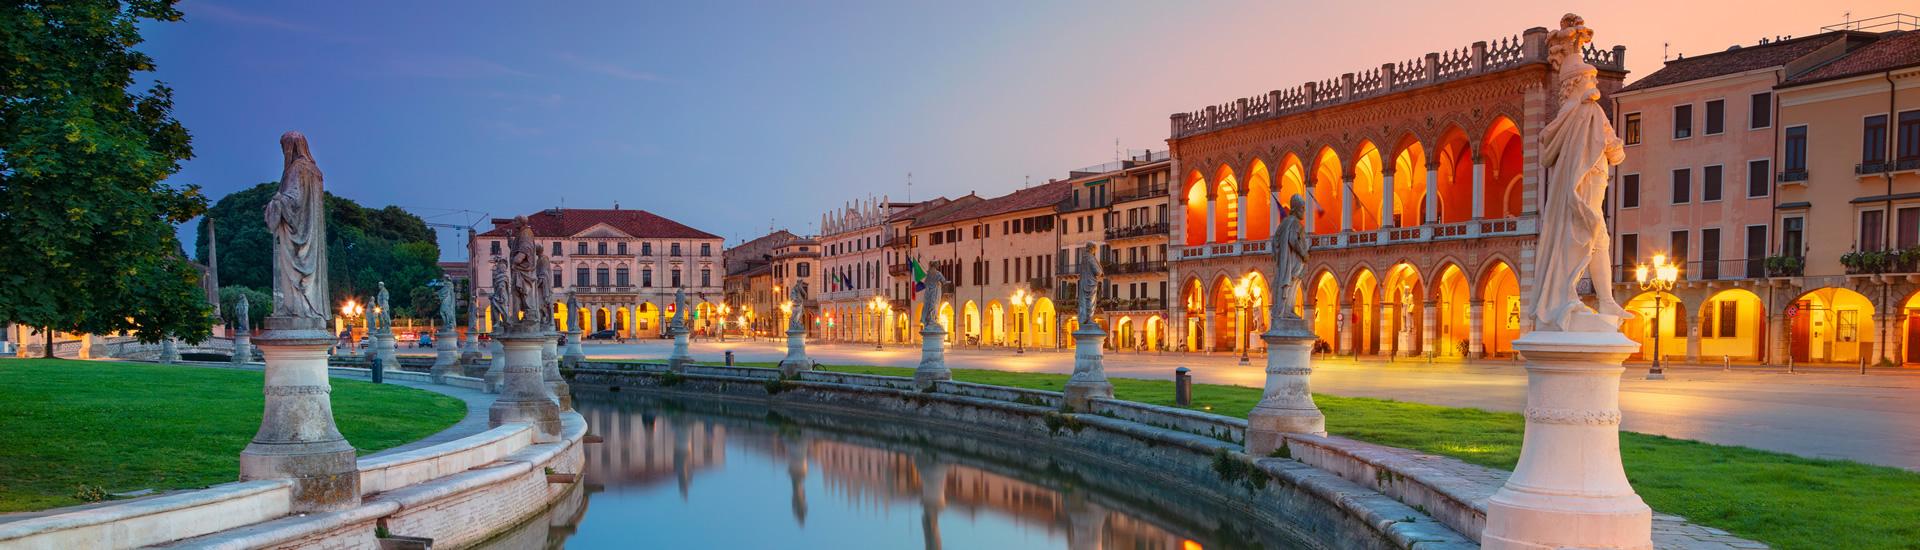 Global Power apre a Padova un nuovo Energy Store